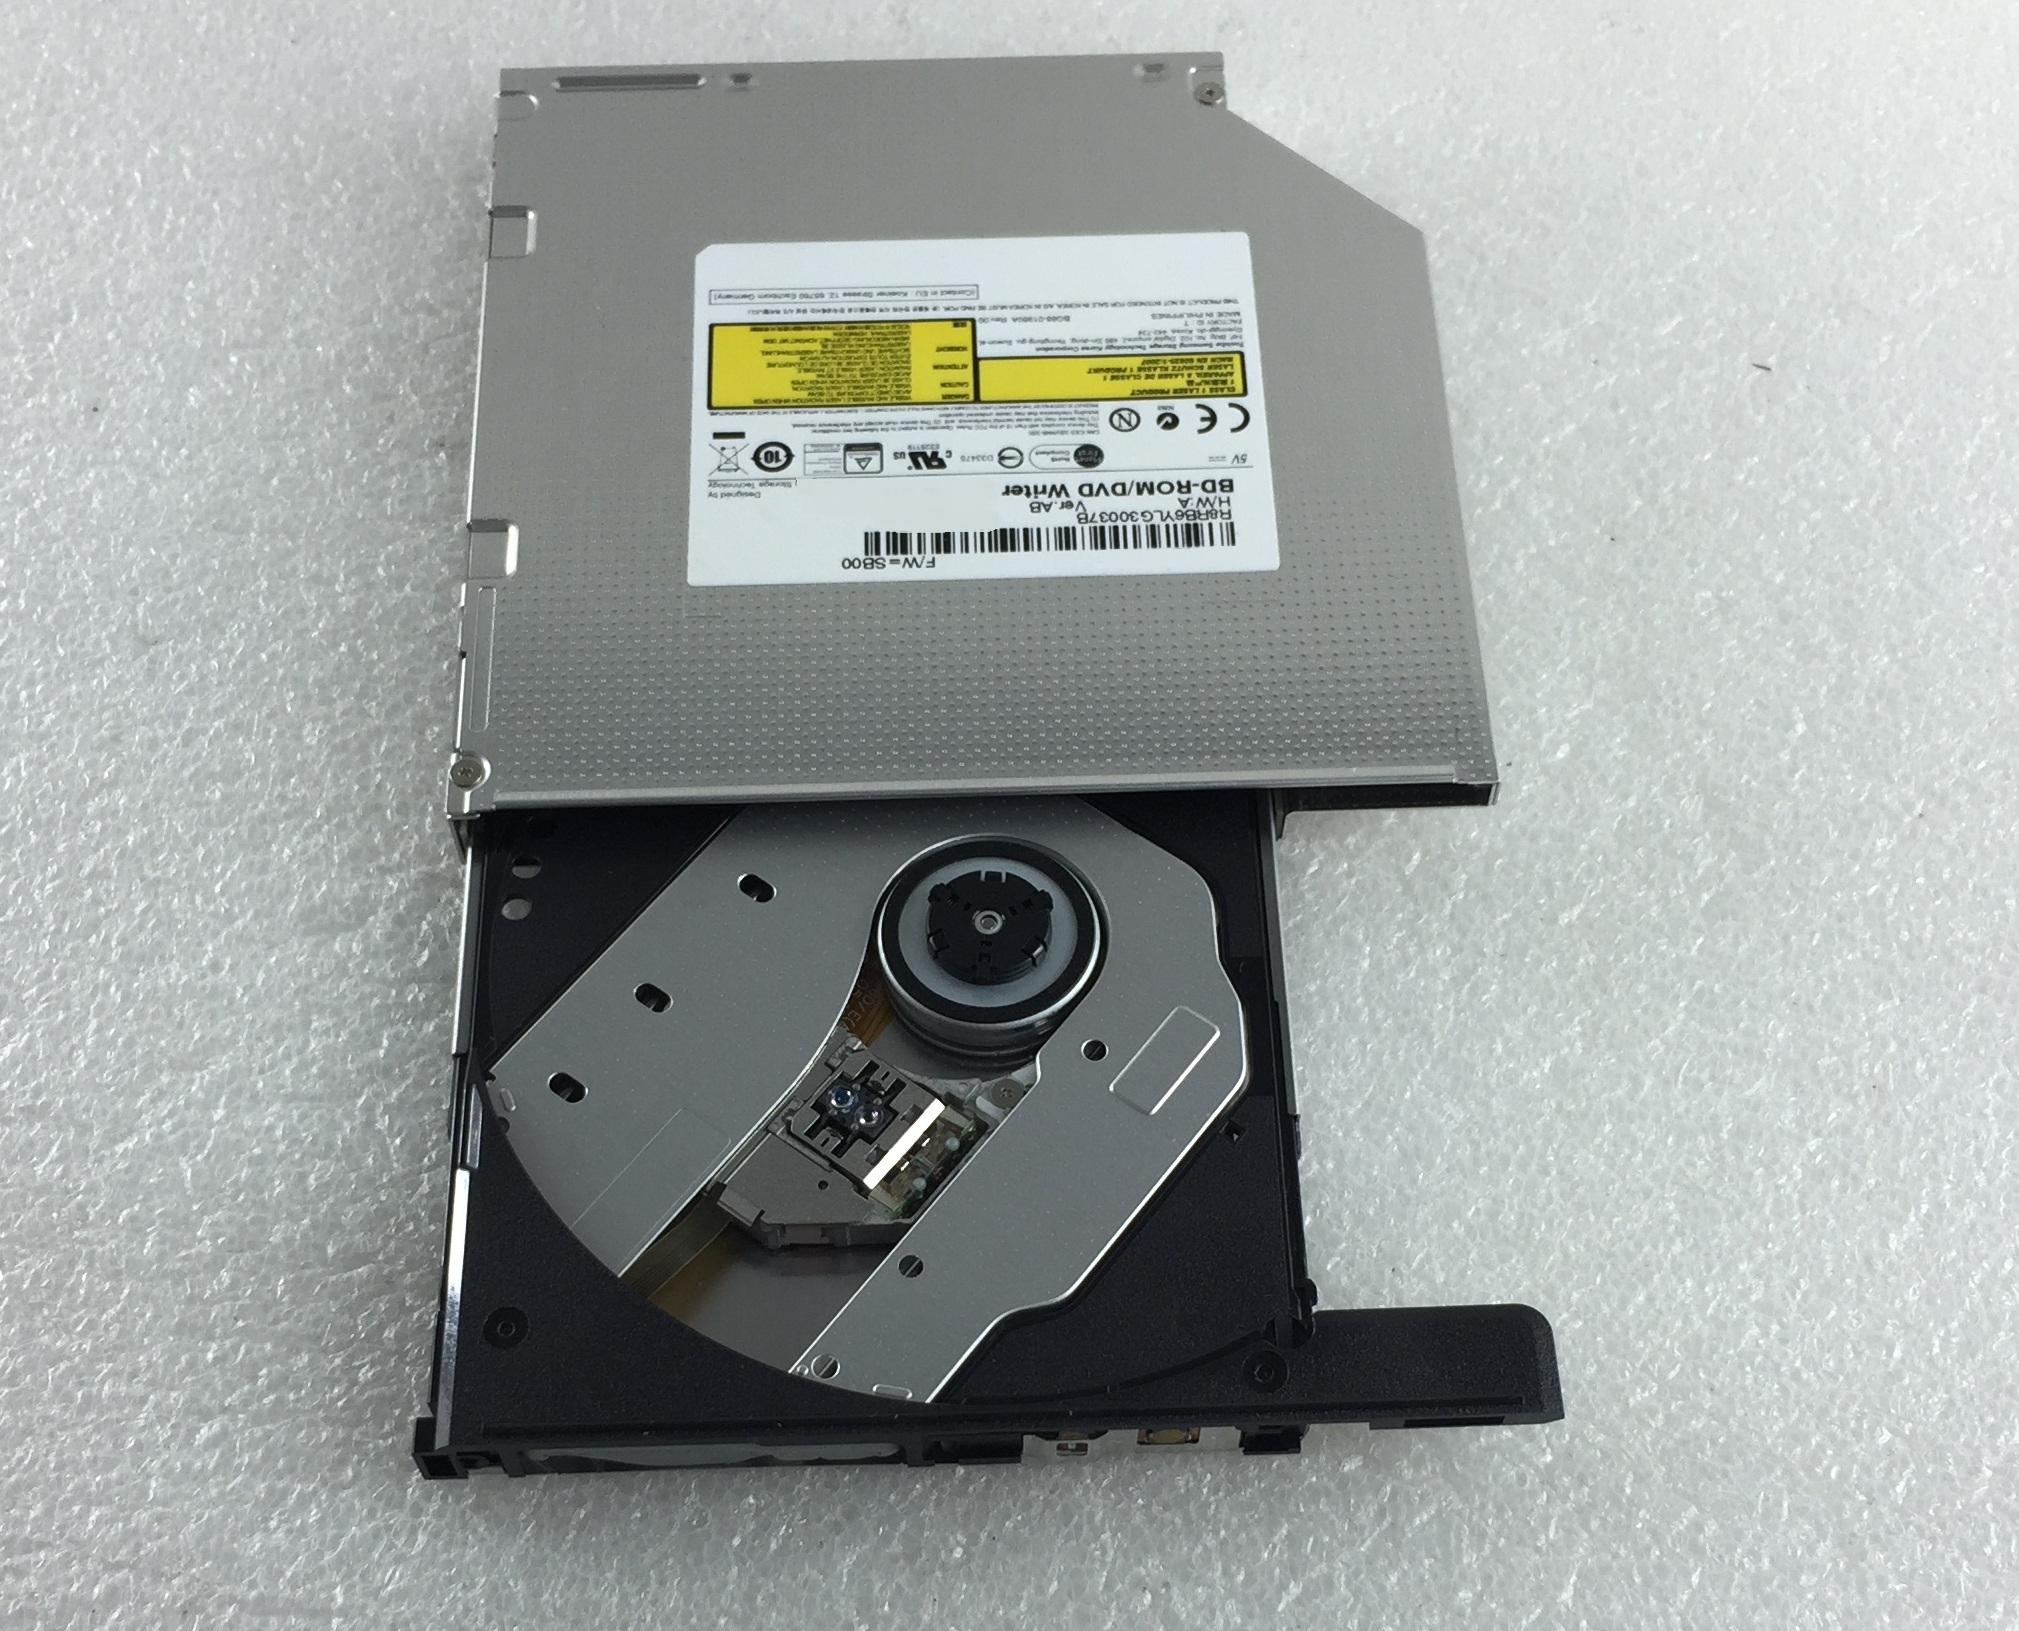 Dell INSPIRON 1525 PP29L Blu-Ray DVD CD Optical drive SATA RW SN-406 ...